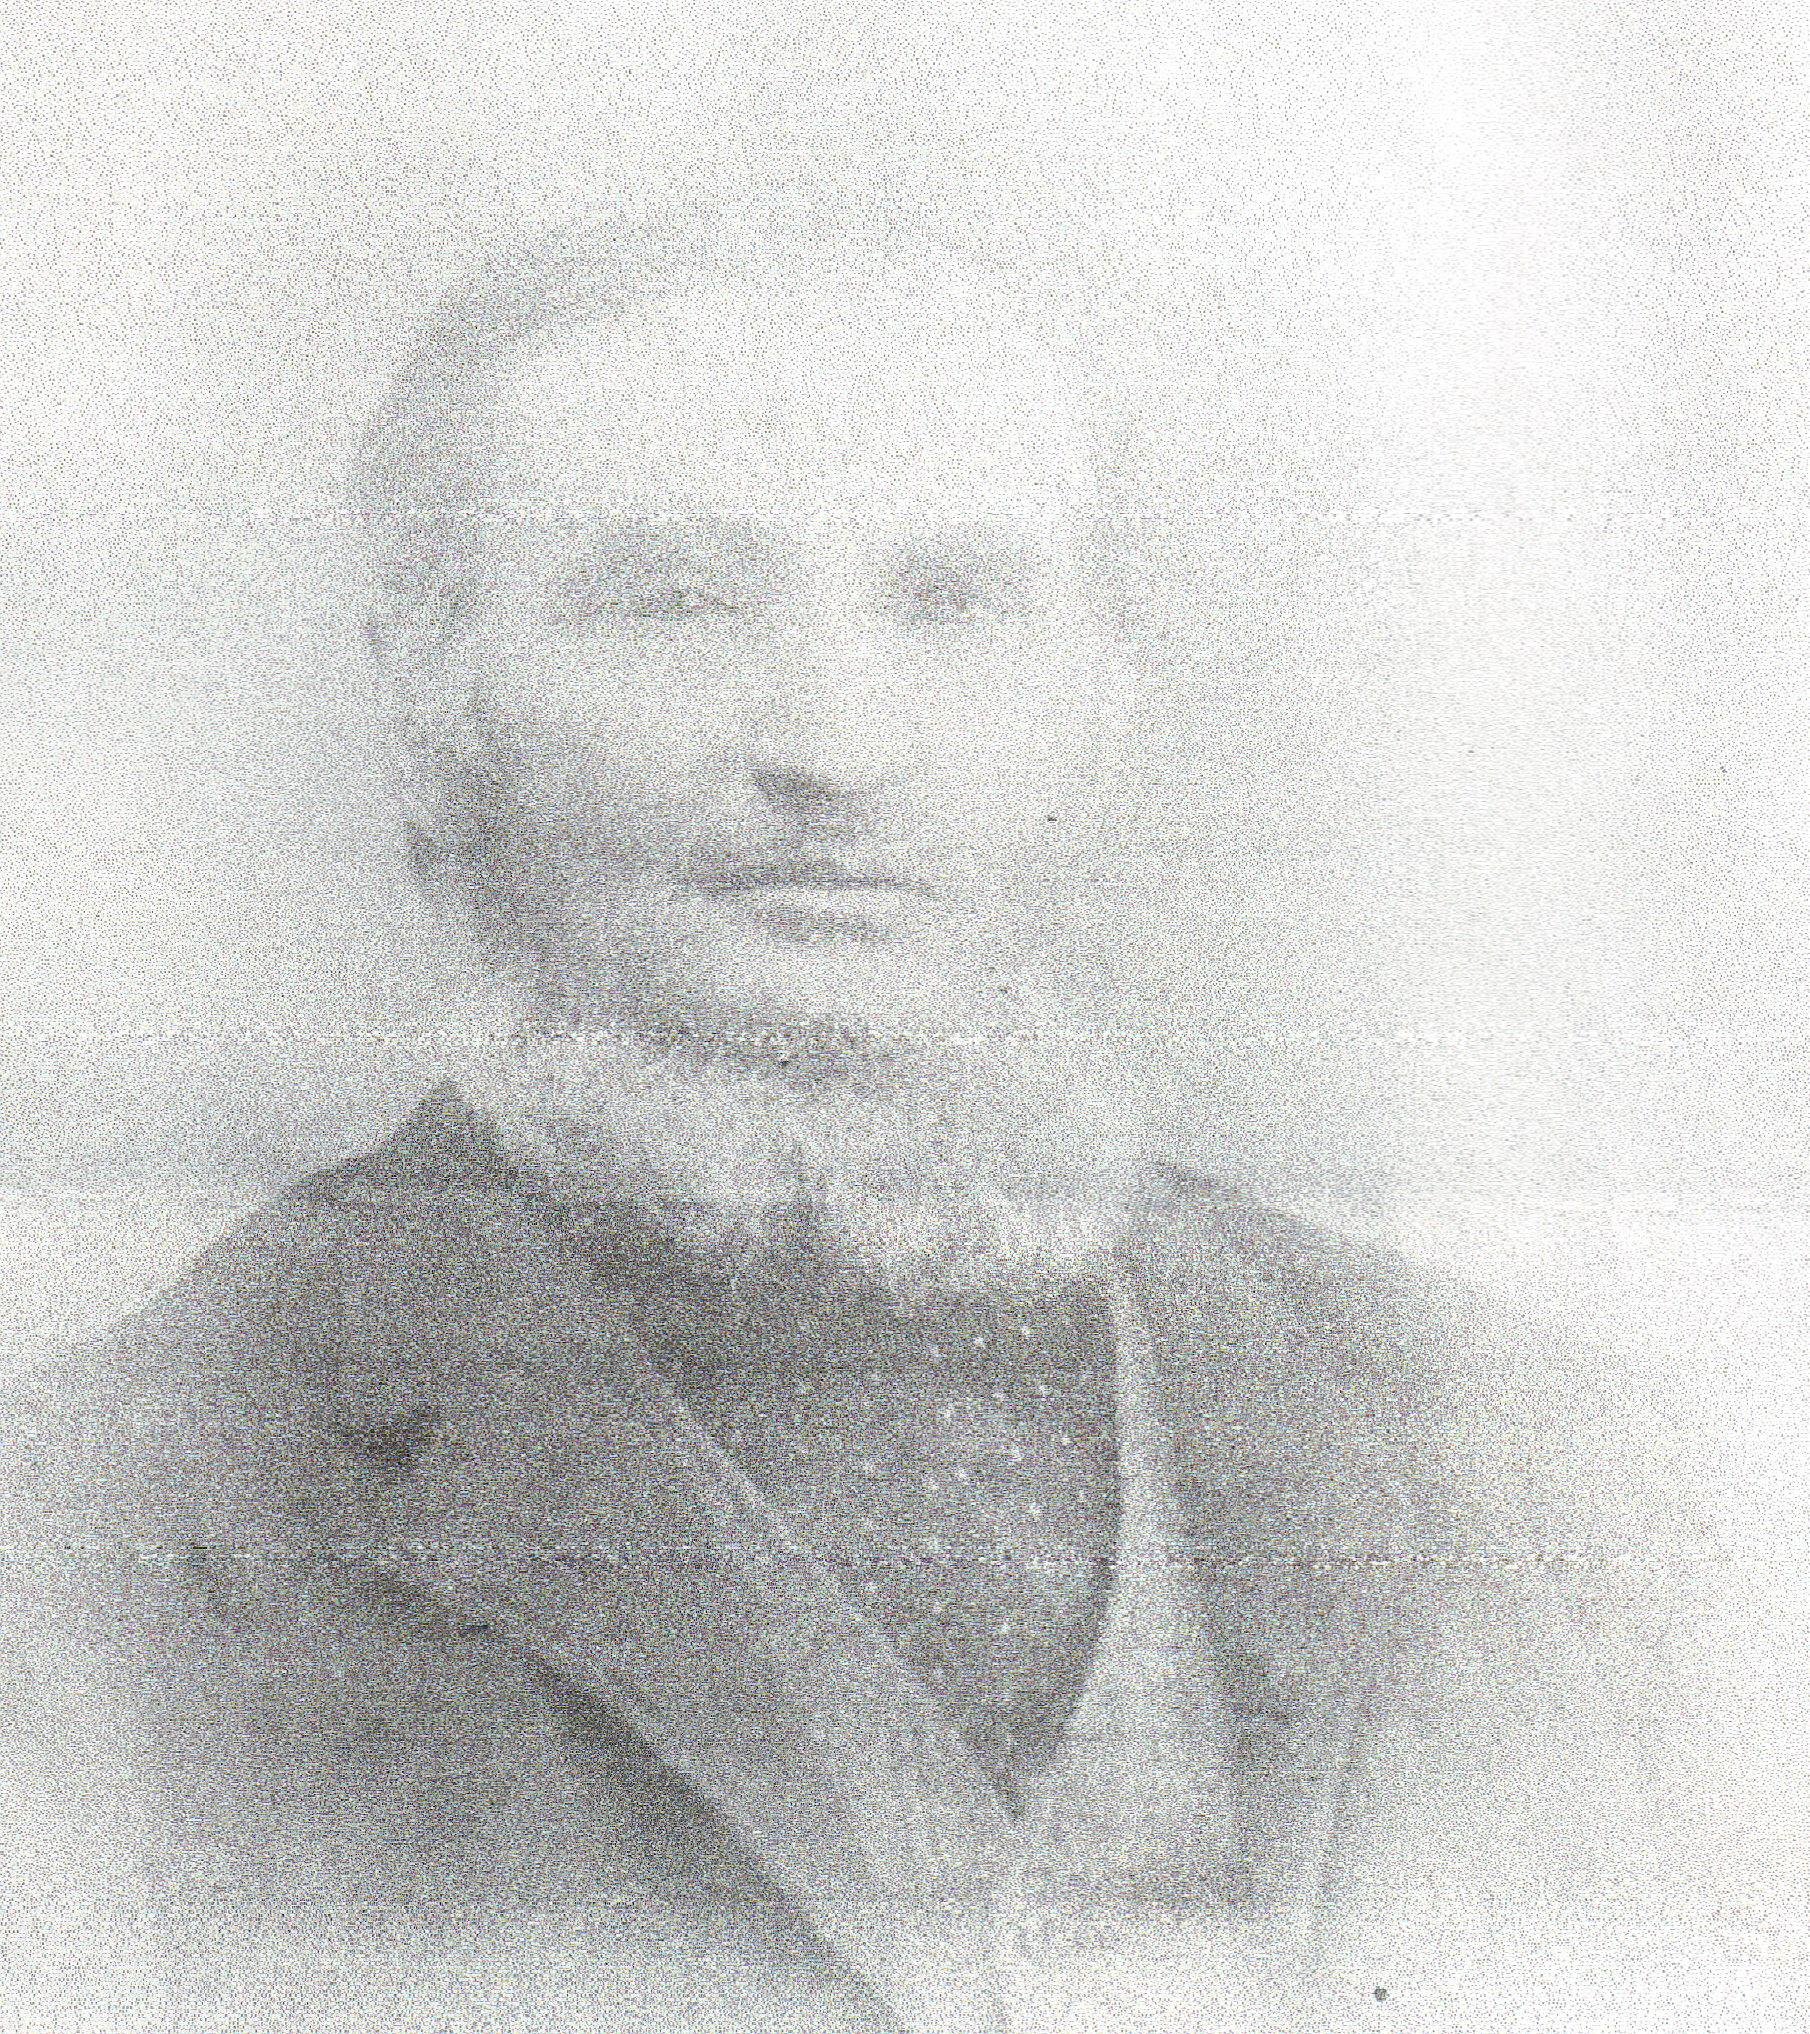 Jon Stephen Tisdel